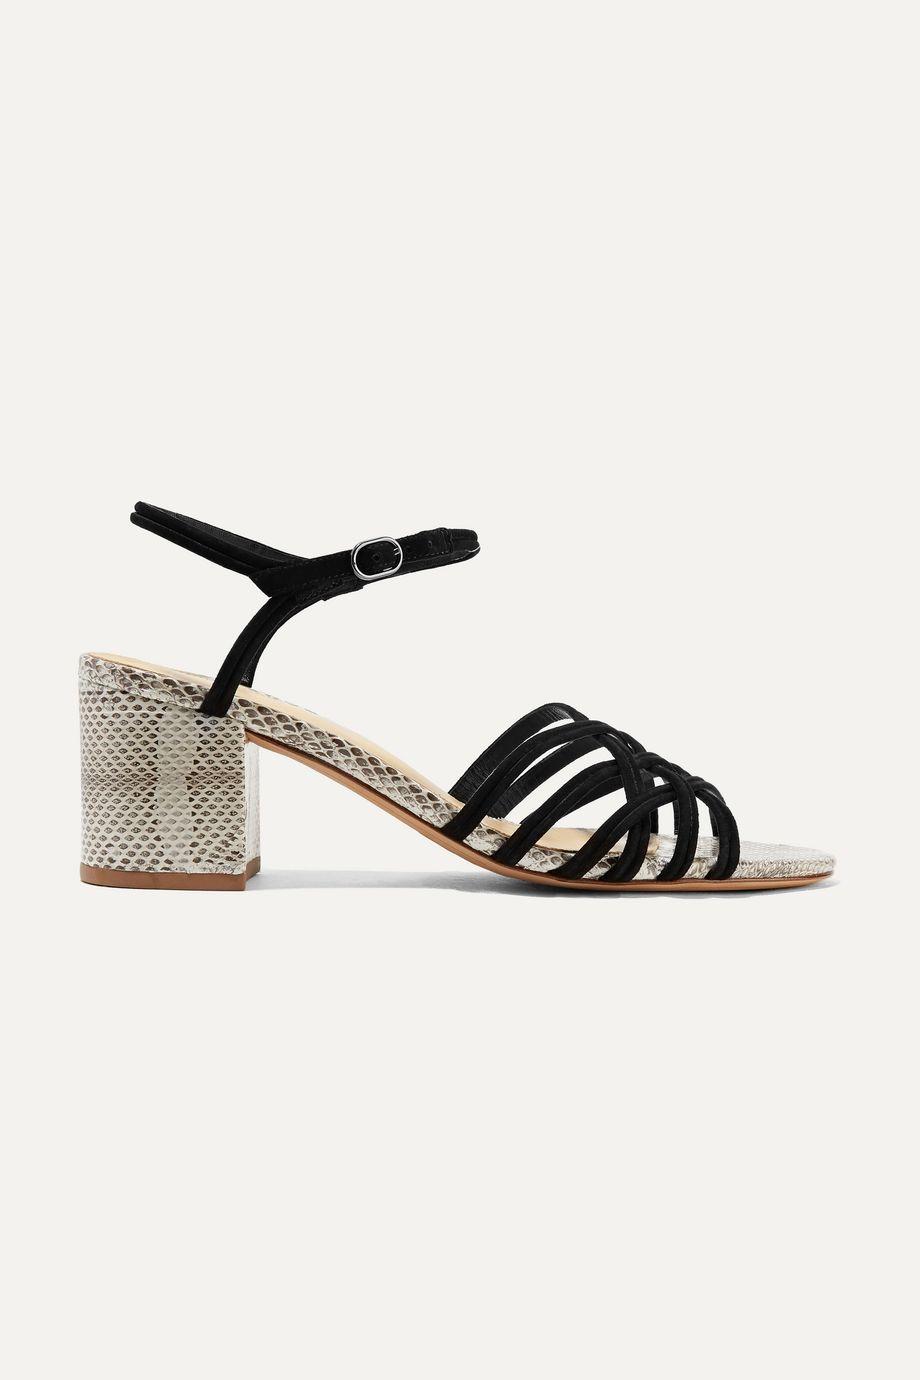 Alexandre Birman Berthe suede and watersnake sandals